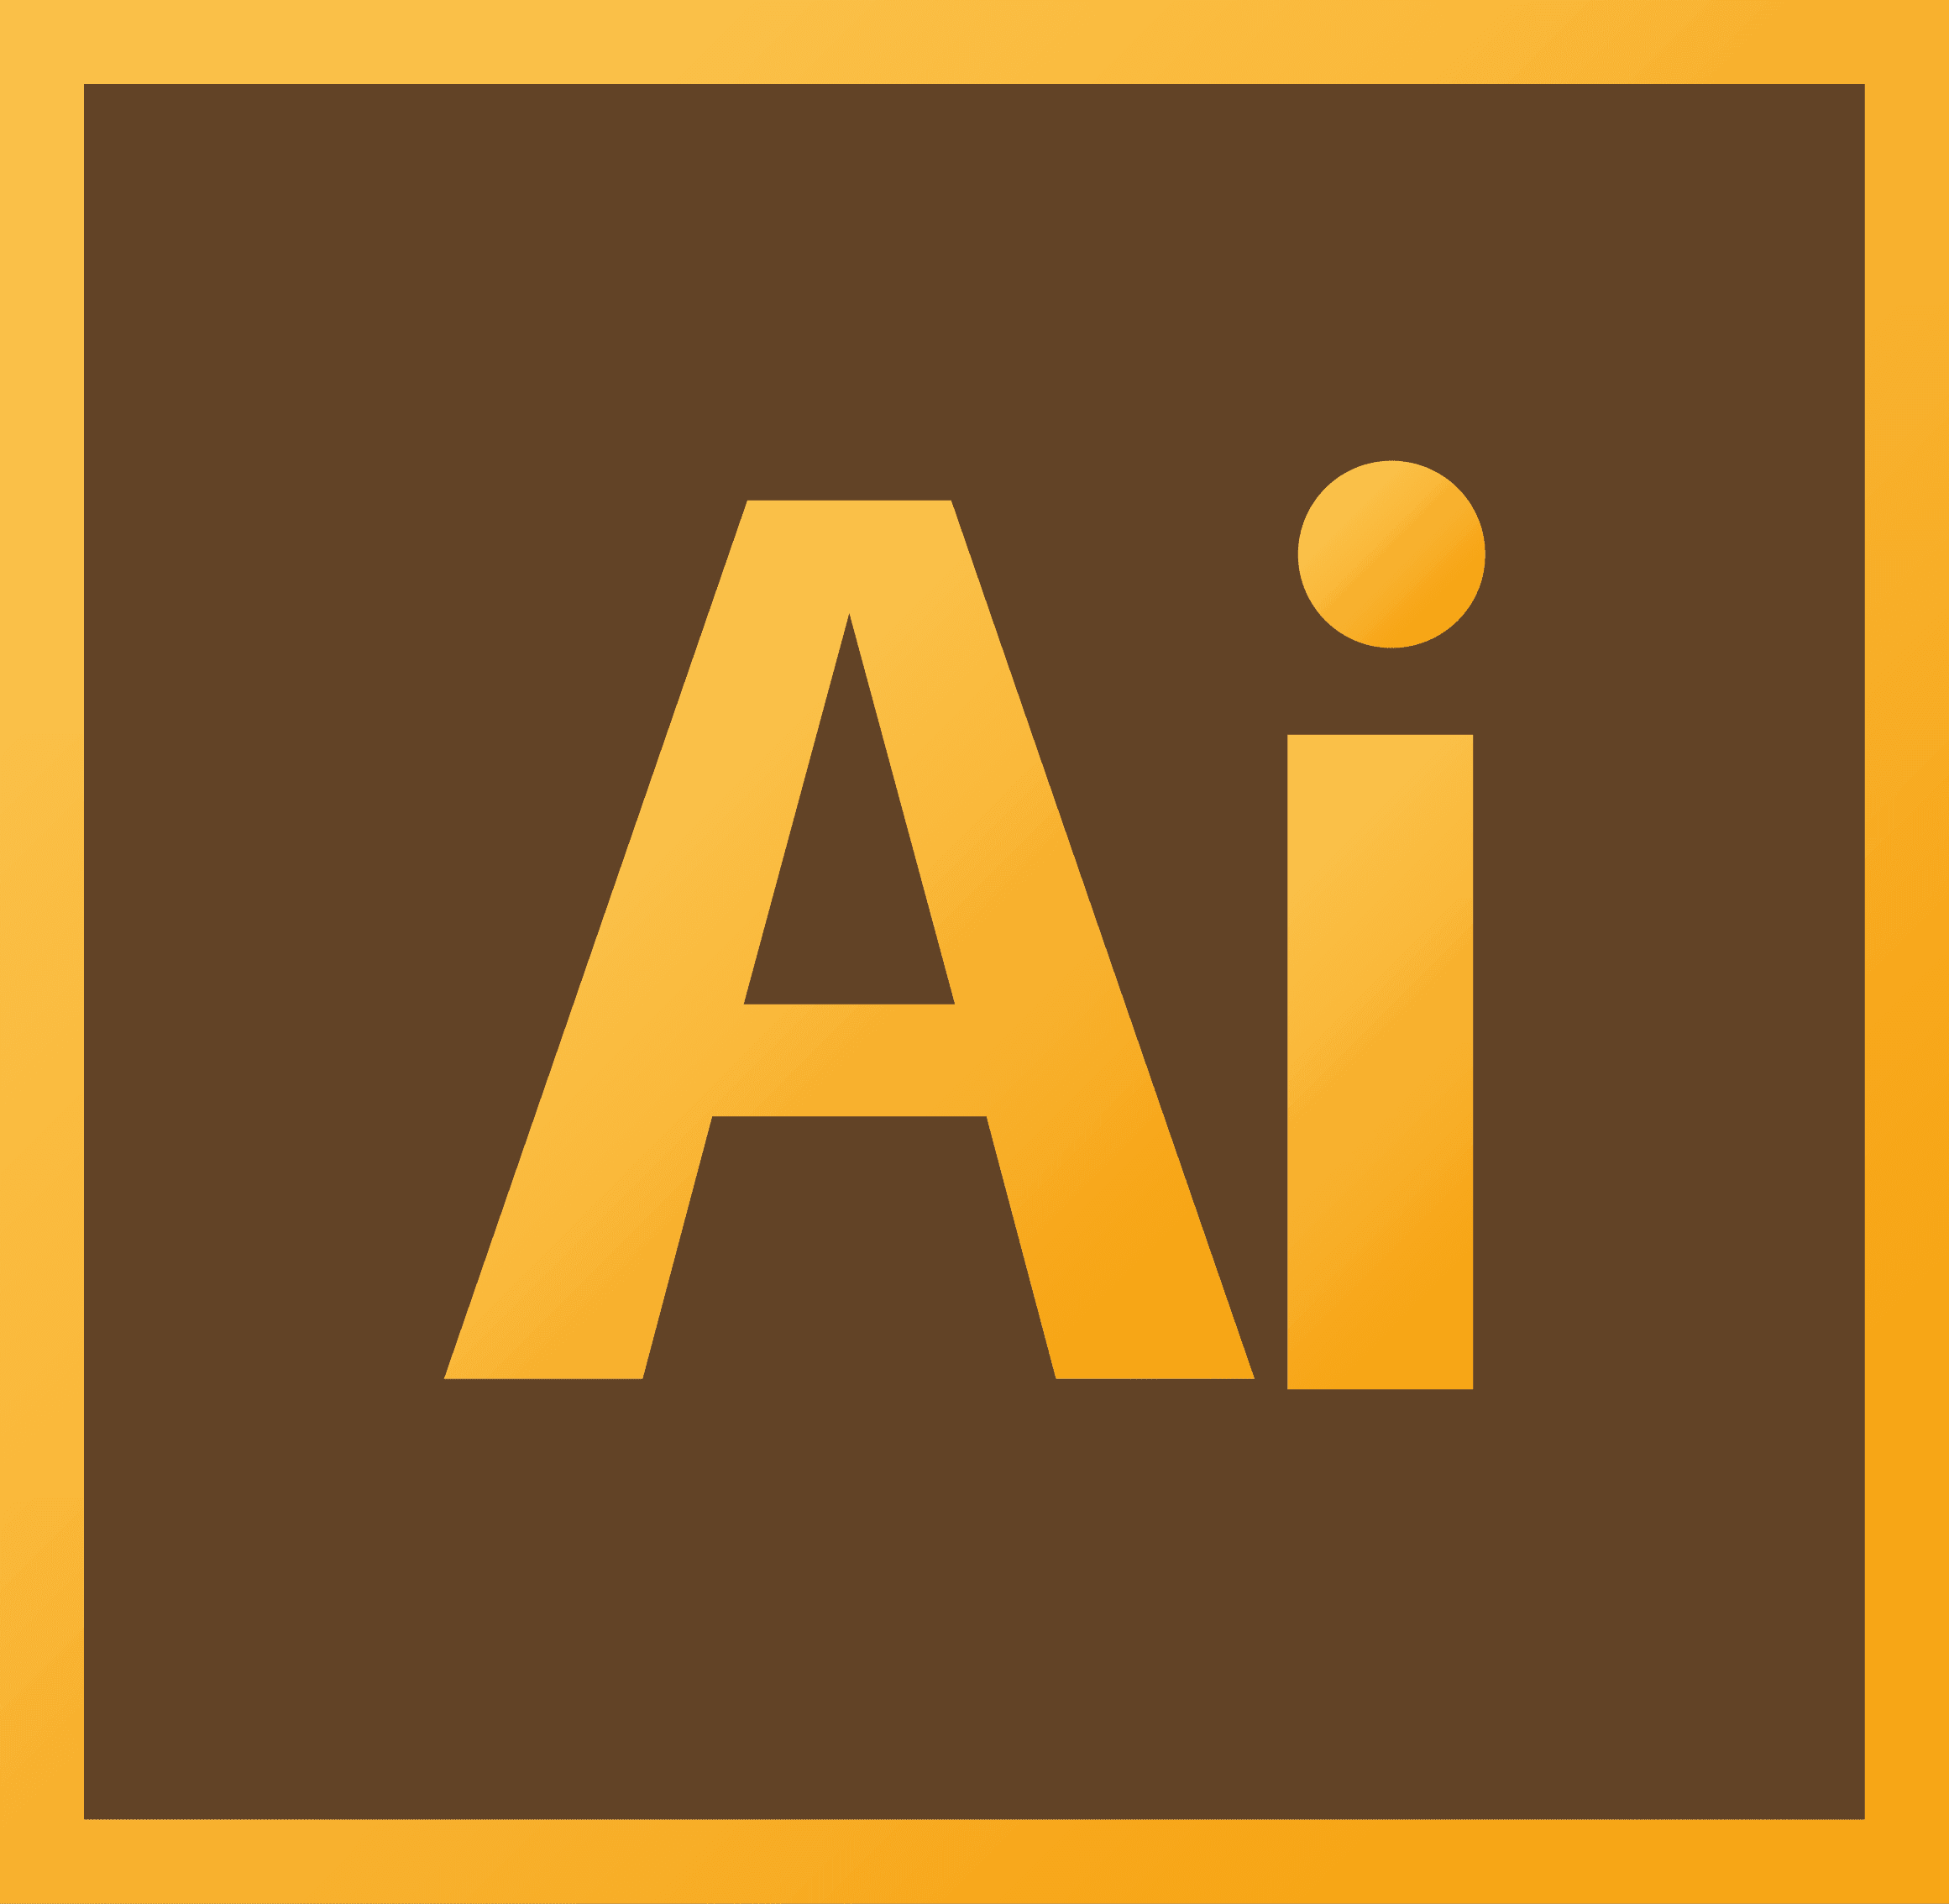 AI Logo [Adobe Illustrator] Vector EPS Free Download, Logo, Icons, Brand Emblems